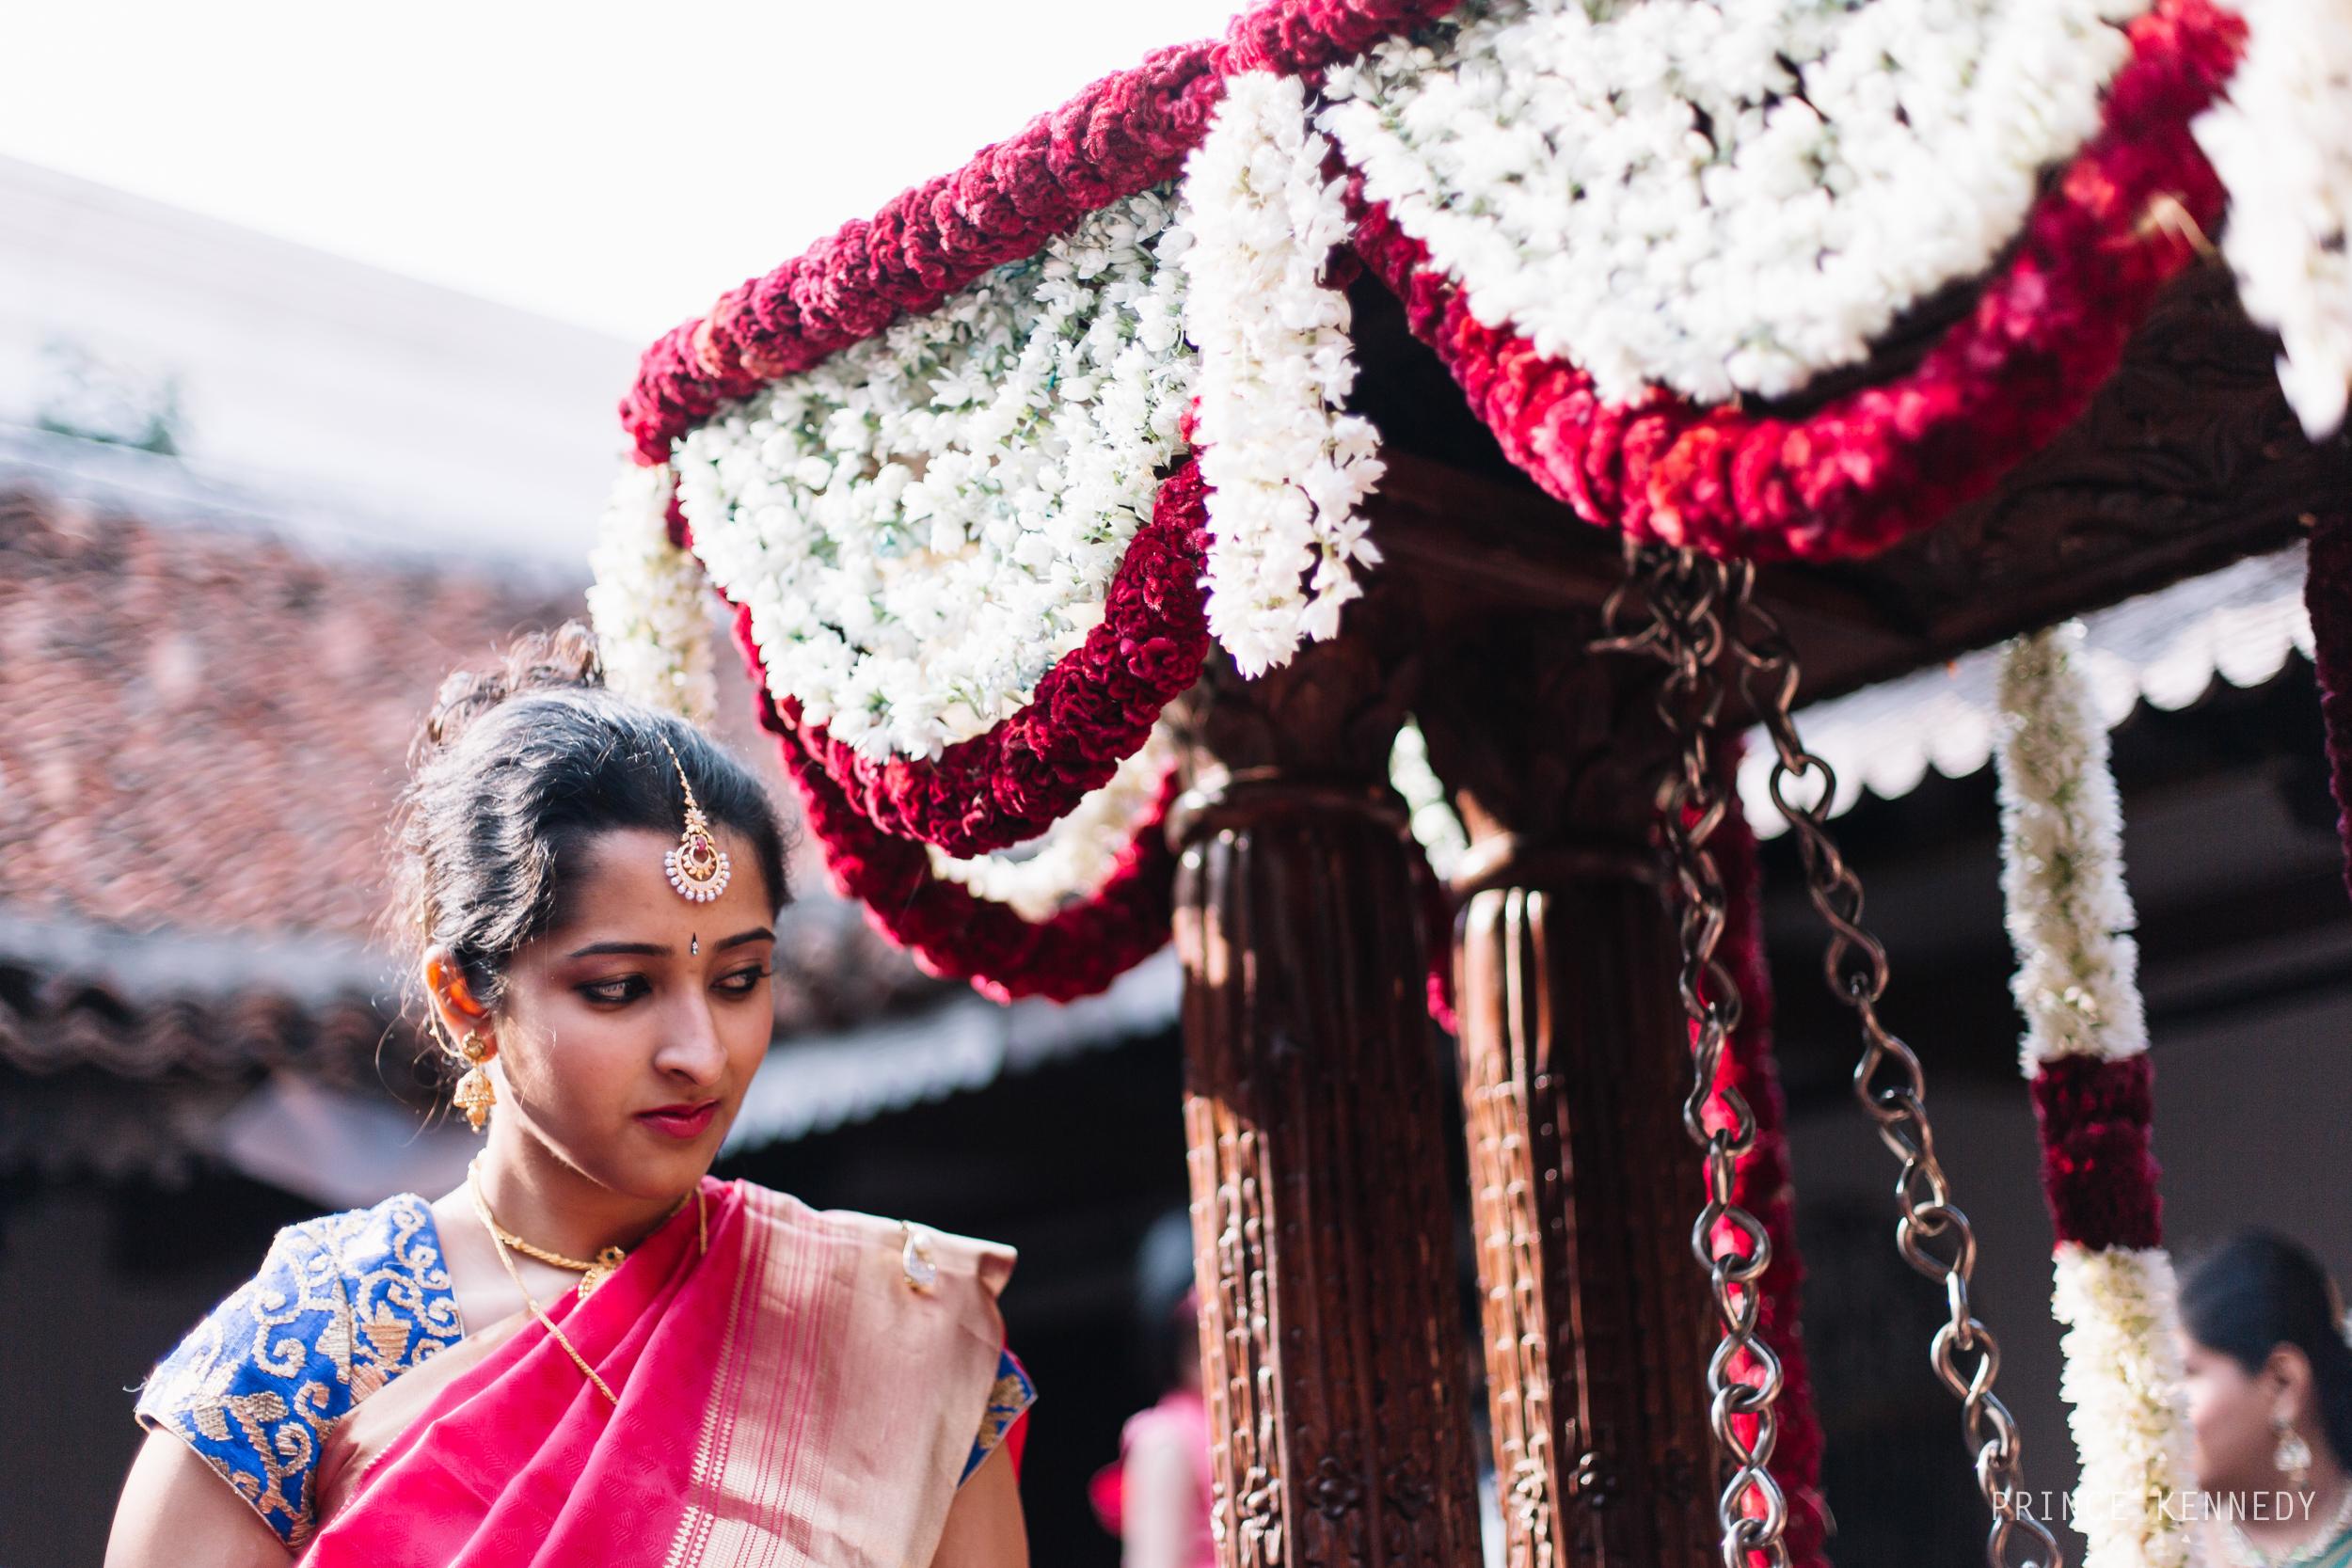 Athmajja-Nithesh-Engagement-Couple-Portrait-Portraiture-Wedding-Couple-Portrait-Chennai-Photographer-Candid-Photography-Destination-Best-Prince-Kennedy-Photography-182.jpg